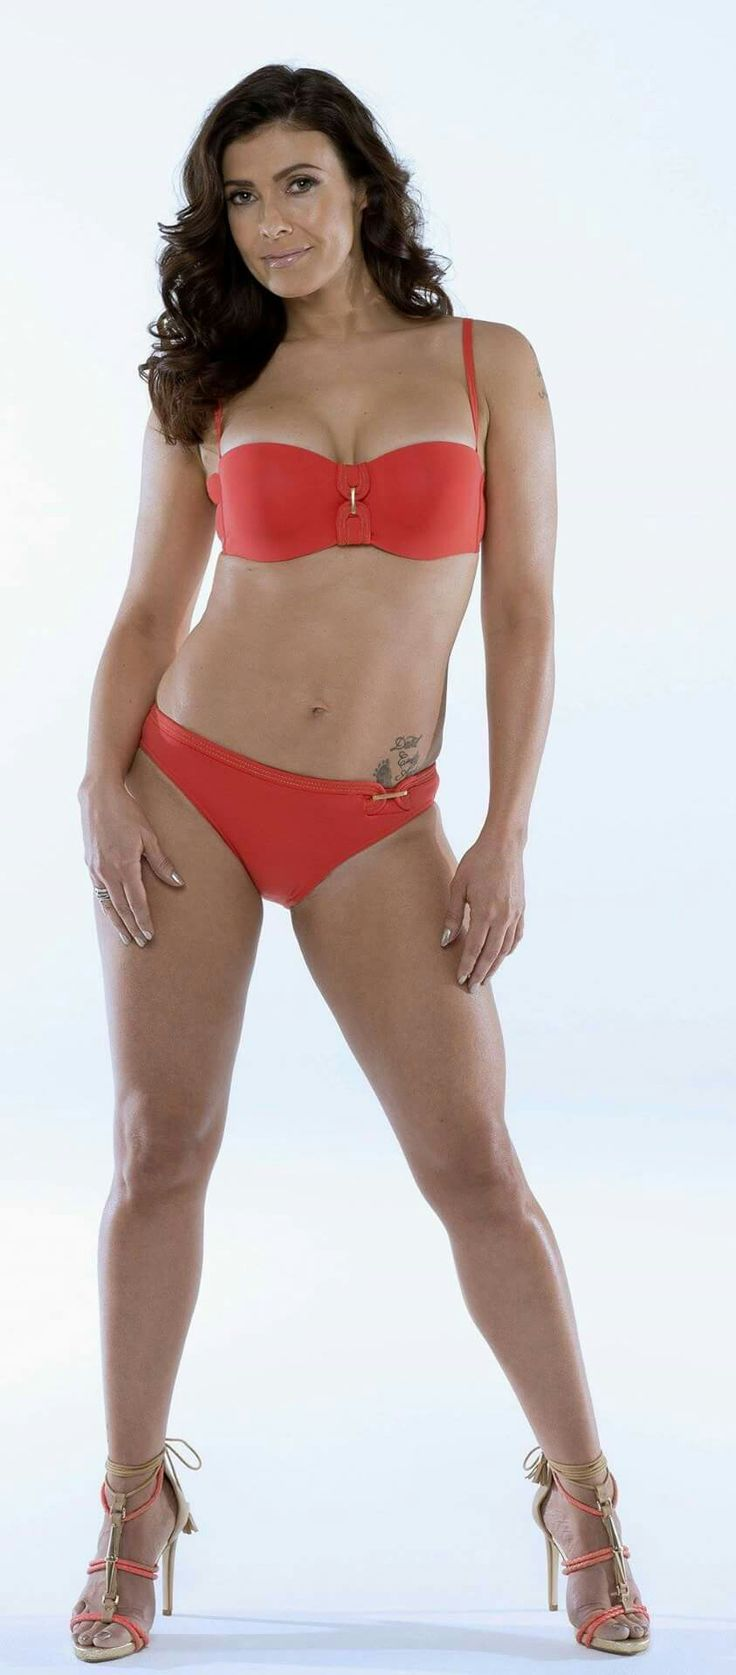 Great arse. Rosie coronation street bikini shots crap Another